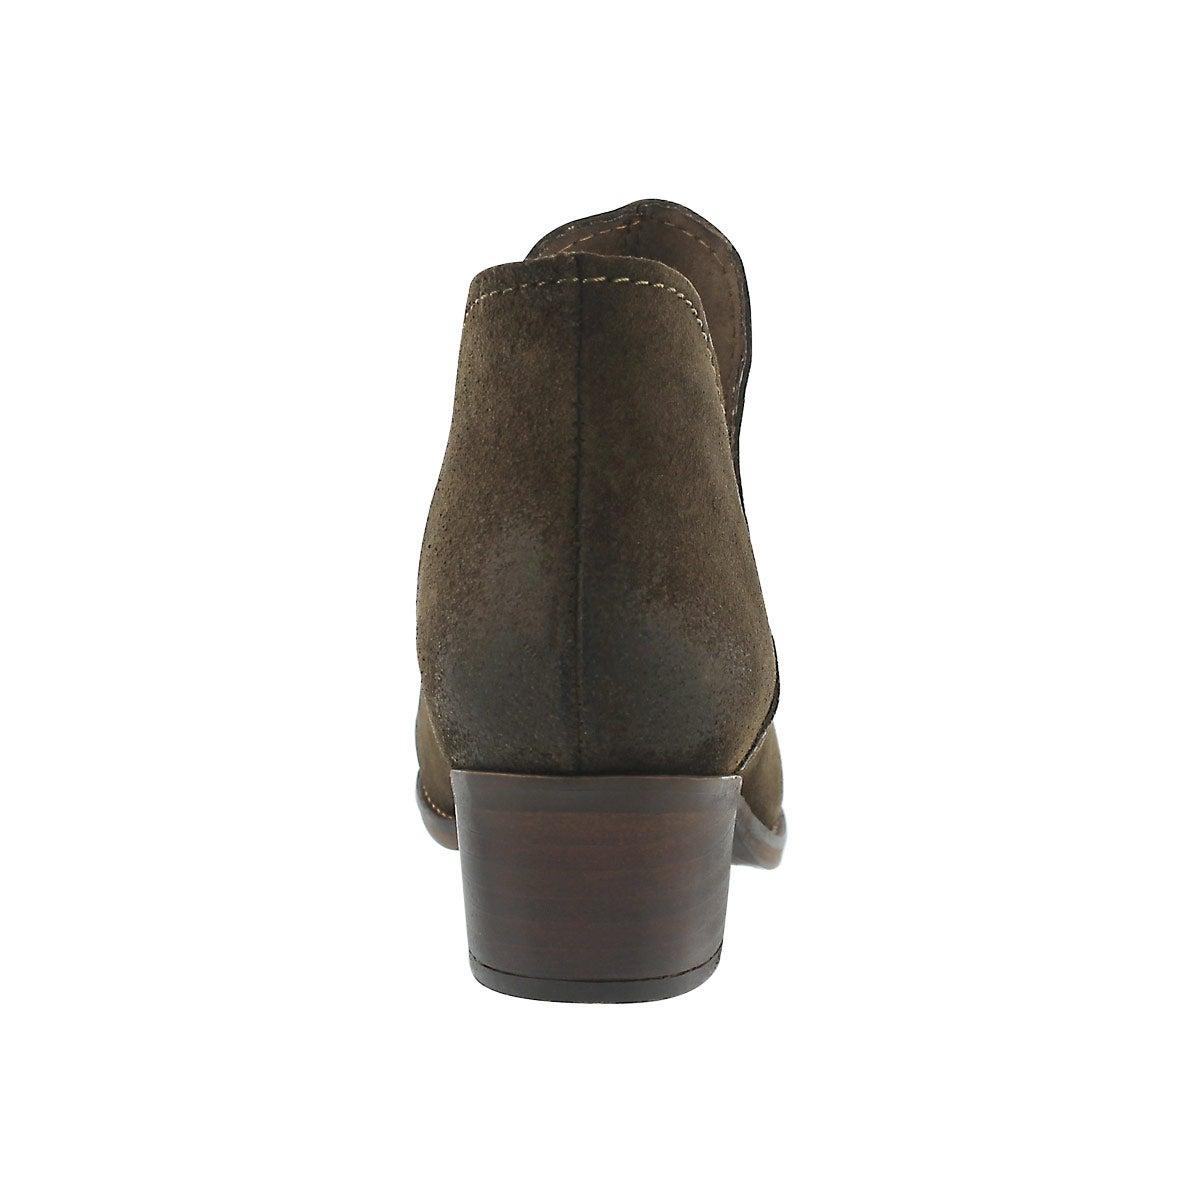 Lds Austin olive slip on ankle boot